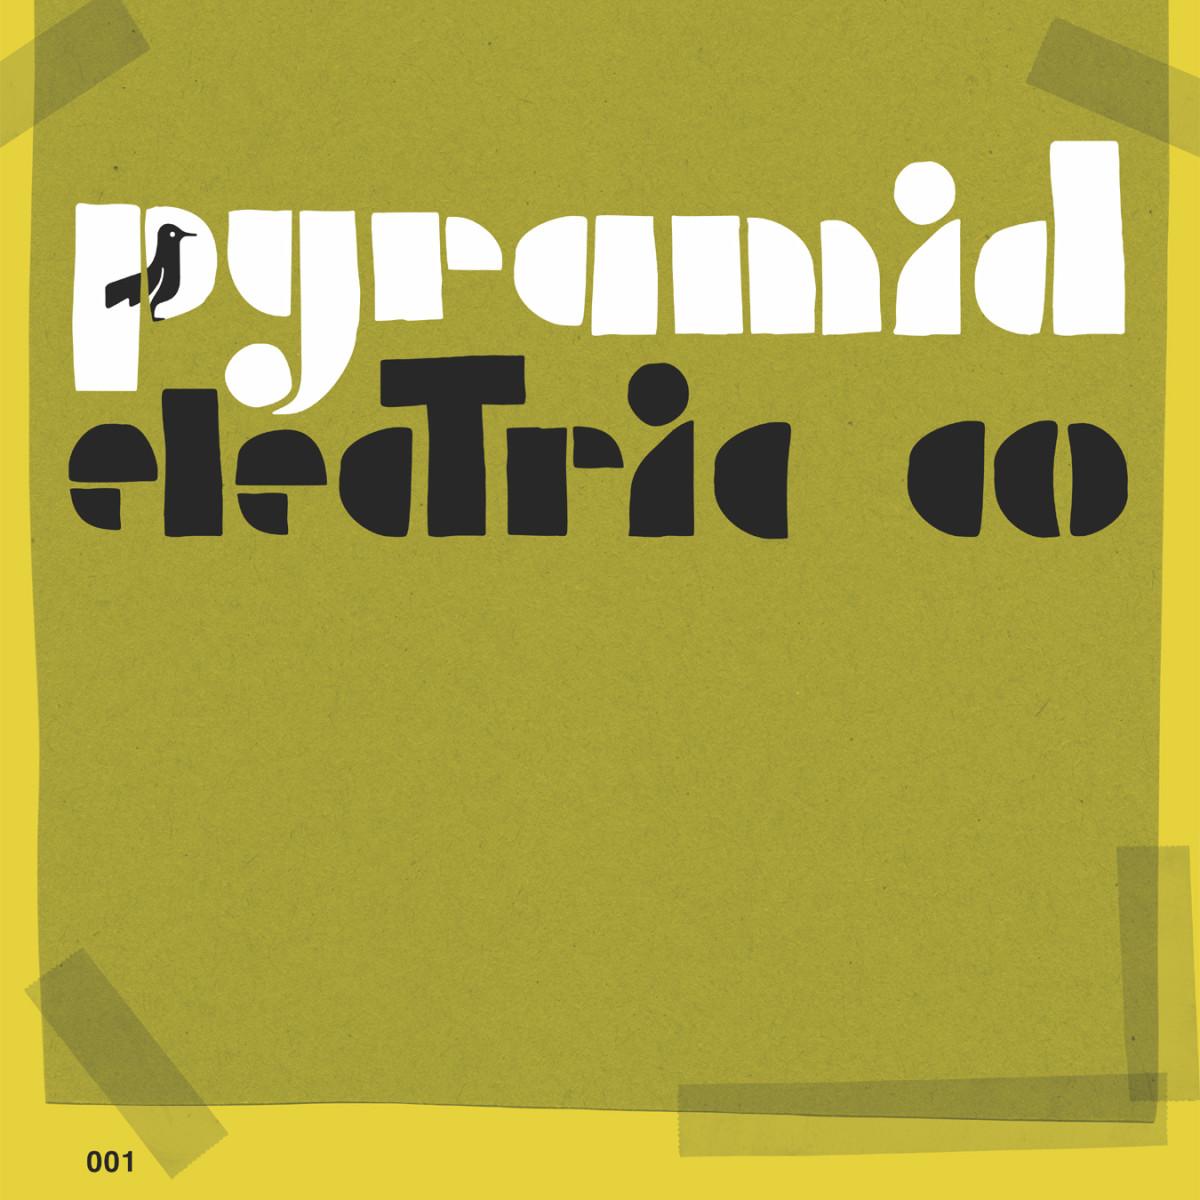 jason molina discography Pyramid Electric Co.